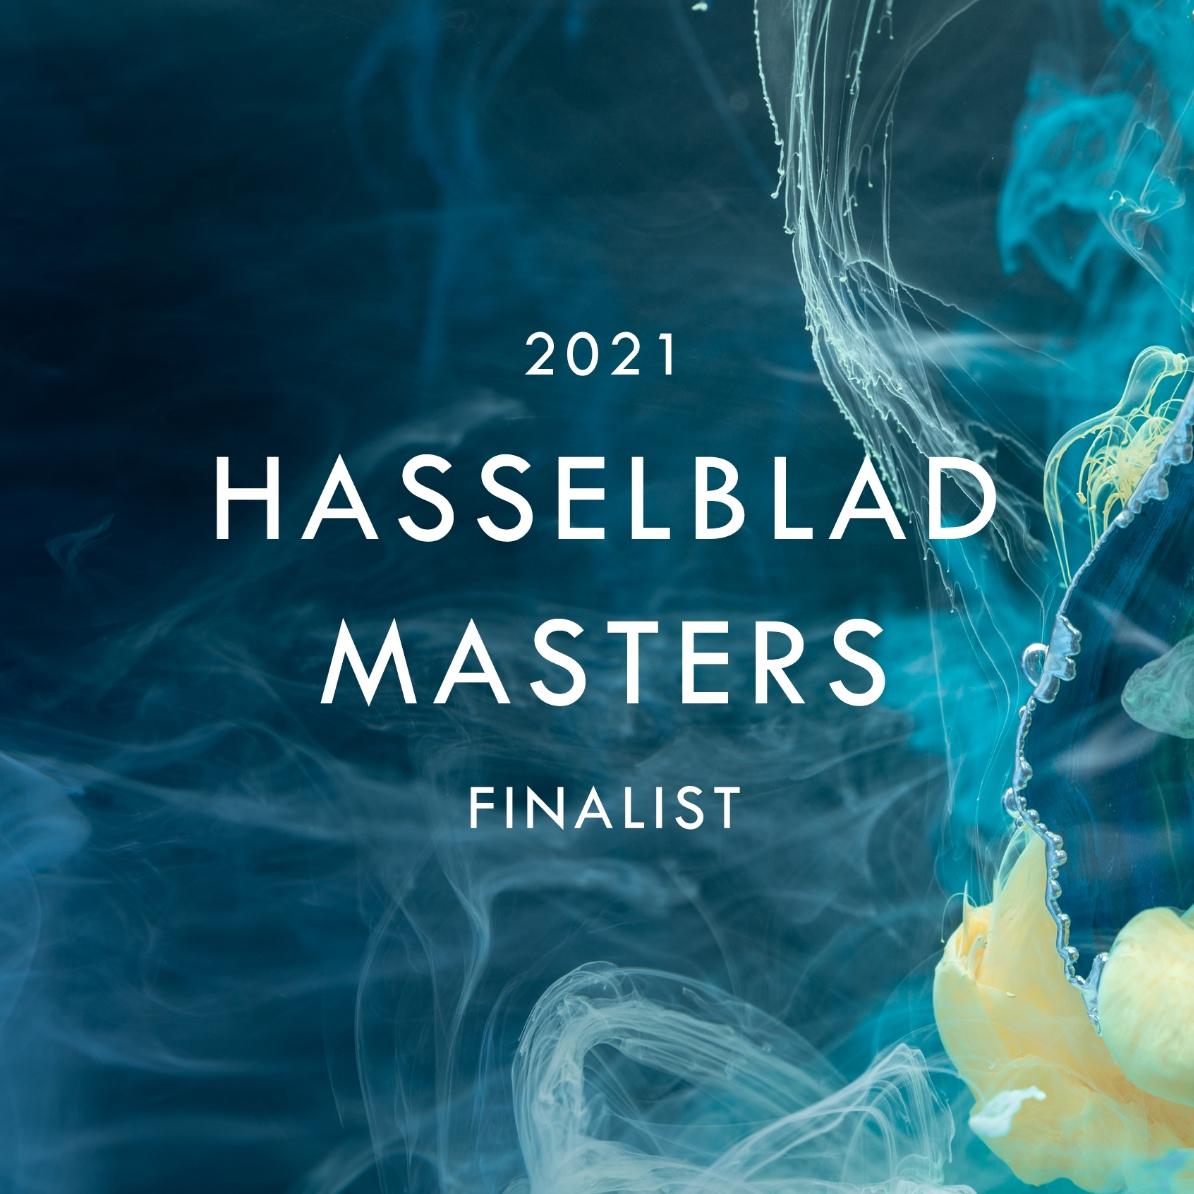 Hasselblad Masters Finalist